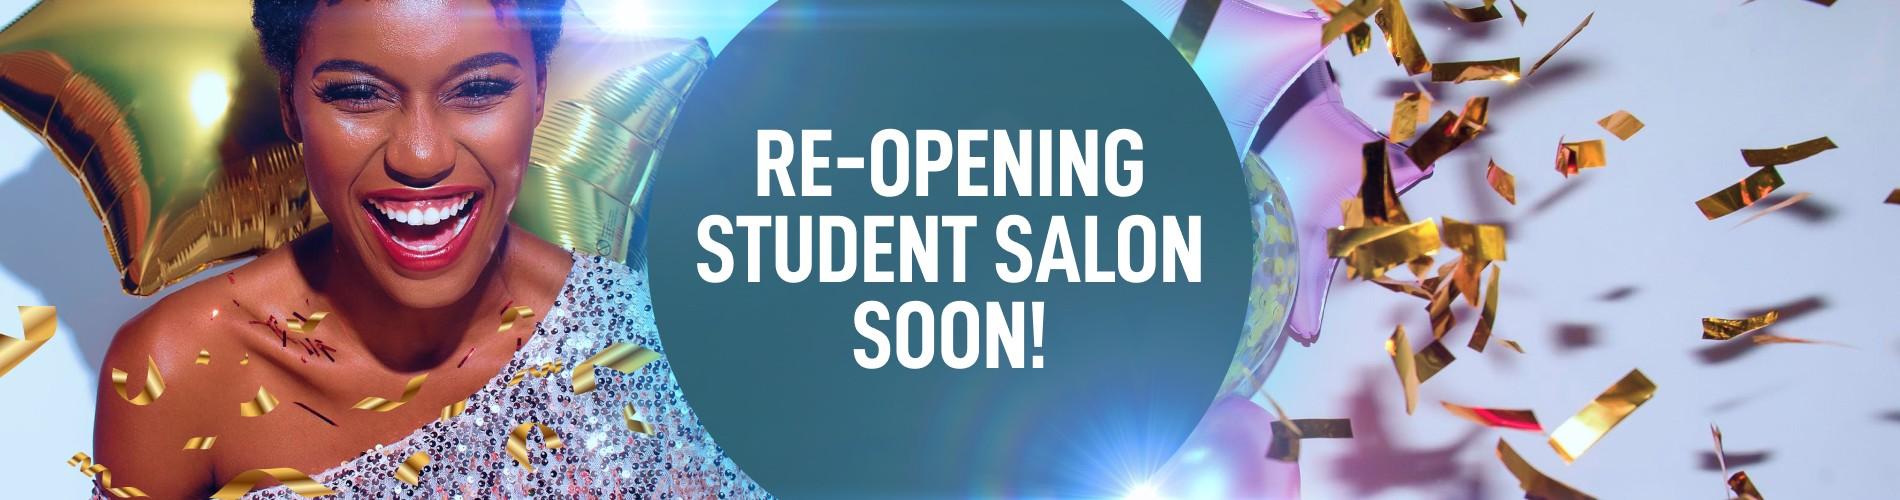 Re-Opening Student Salon Soon